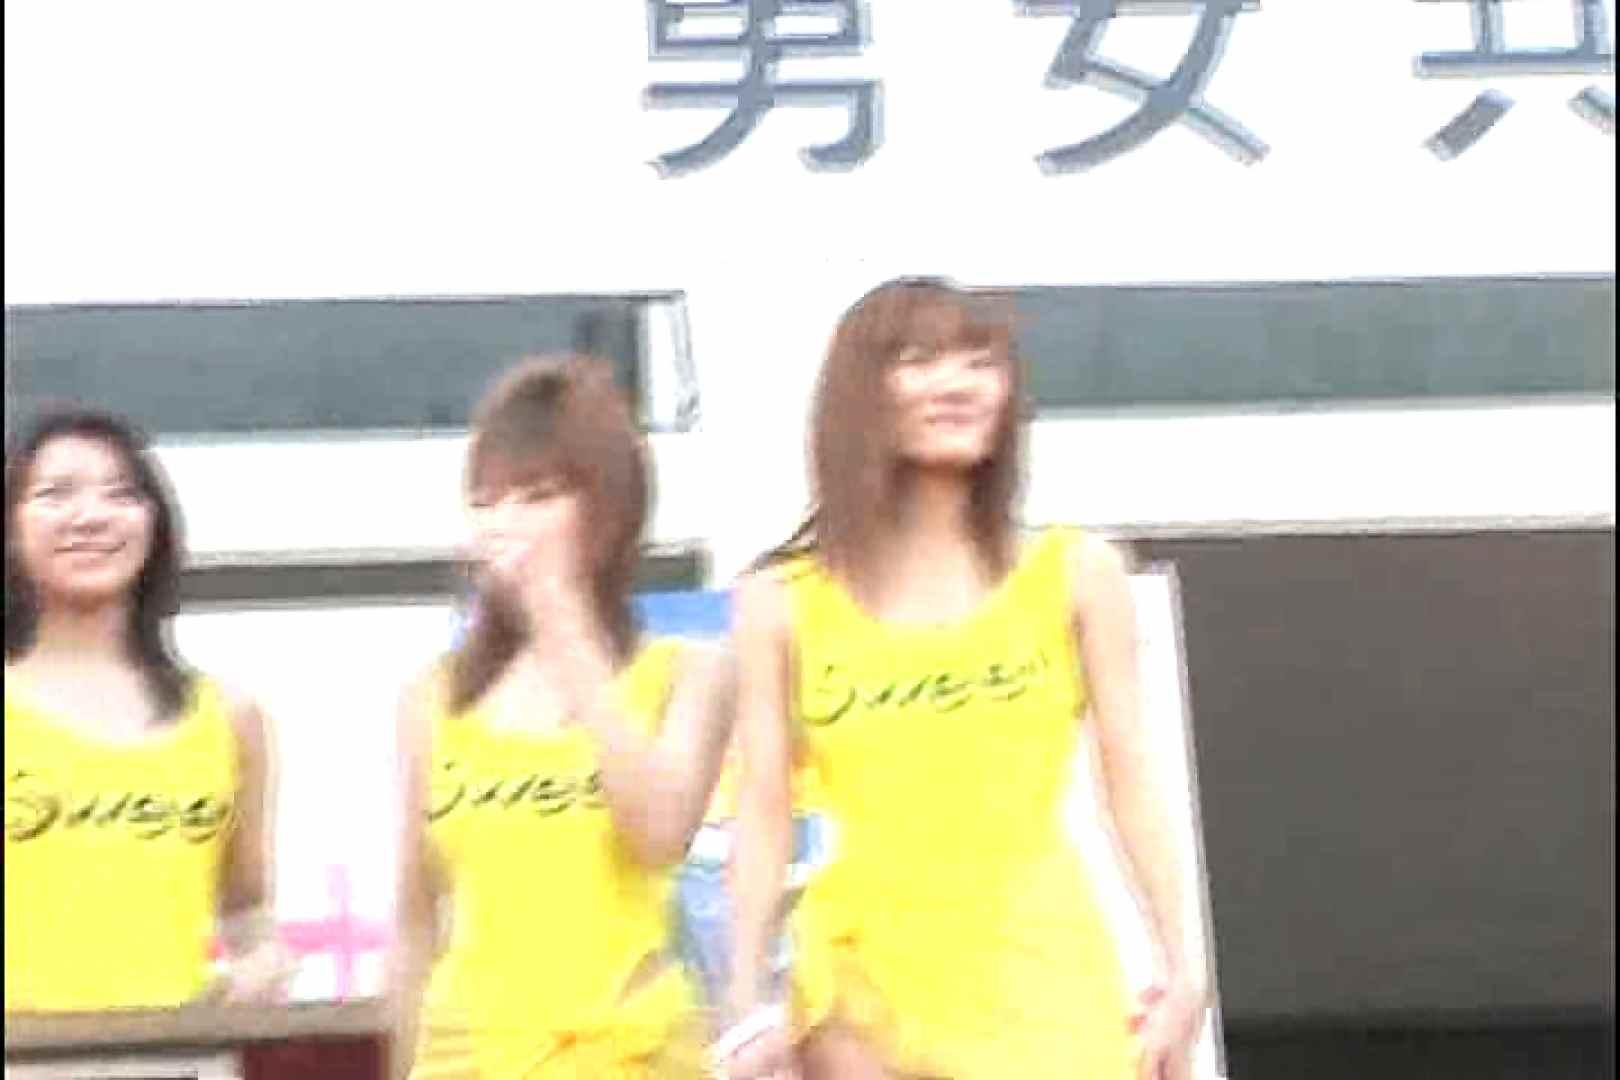 RQカメラ地獄Vol.13 レースクイーン 盗撮おめこ無修正動画無料 95画像 34